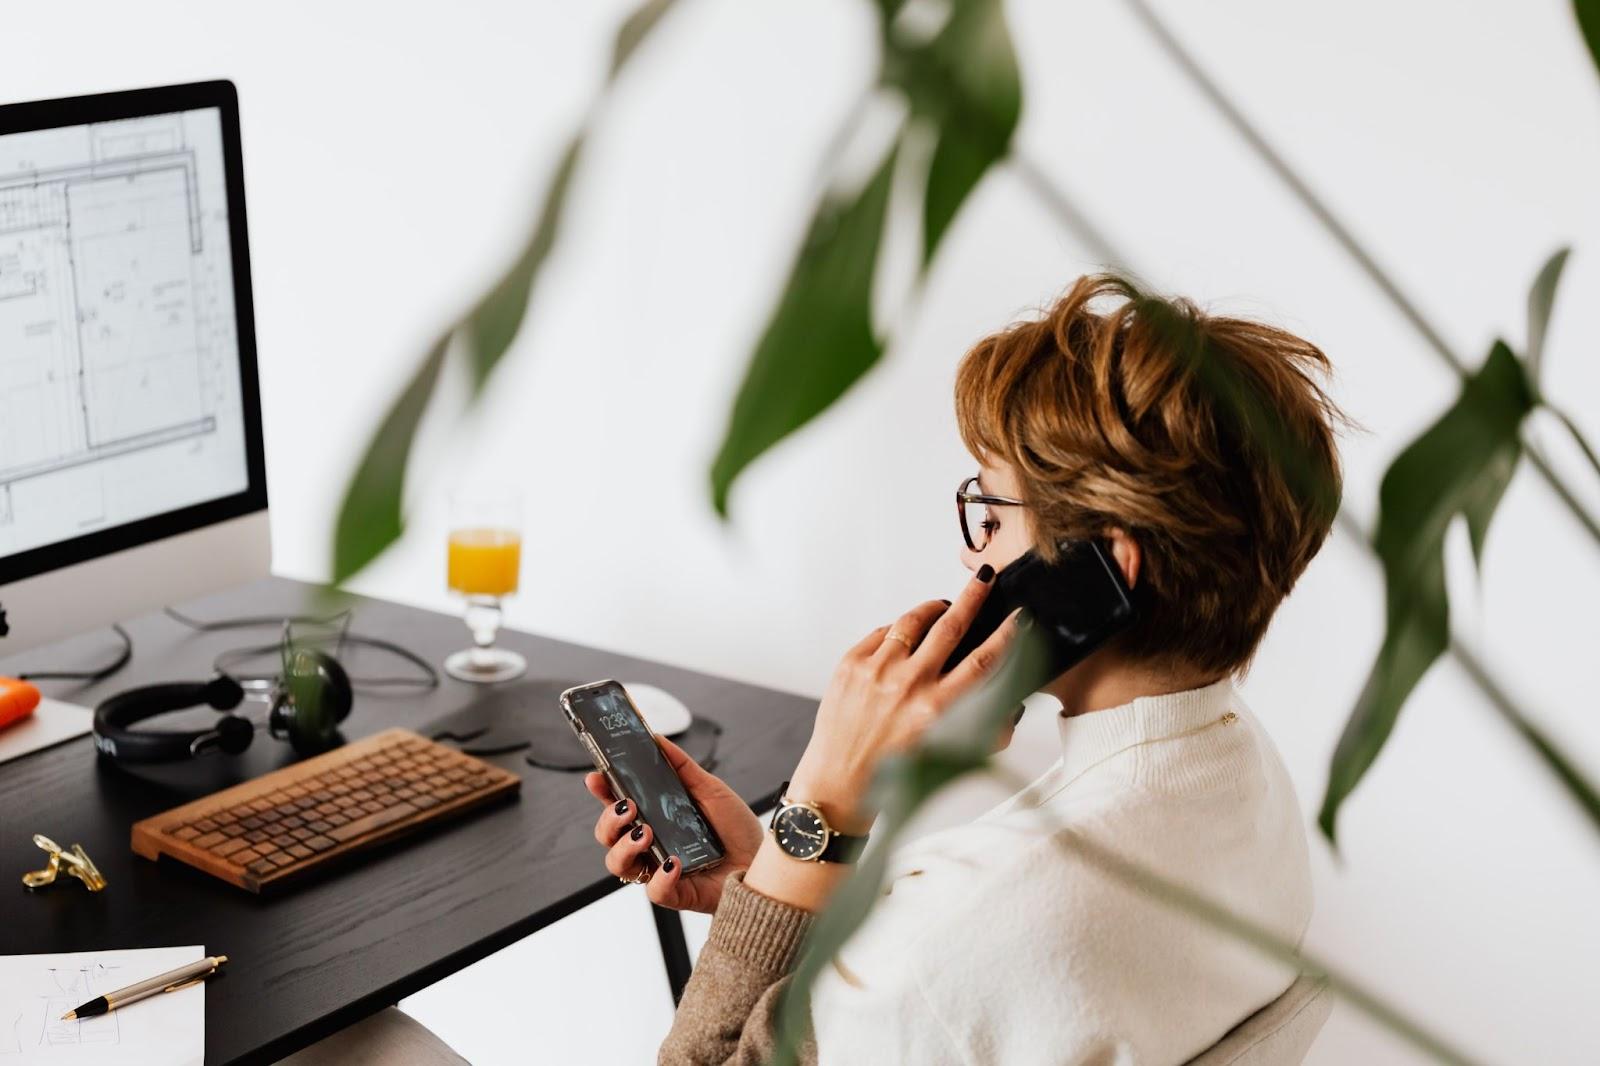 How to improve multitasking skills